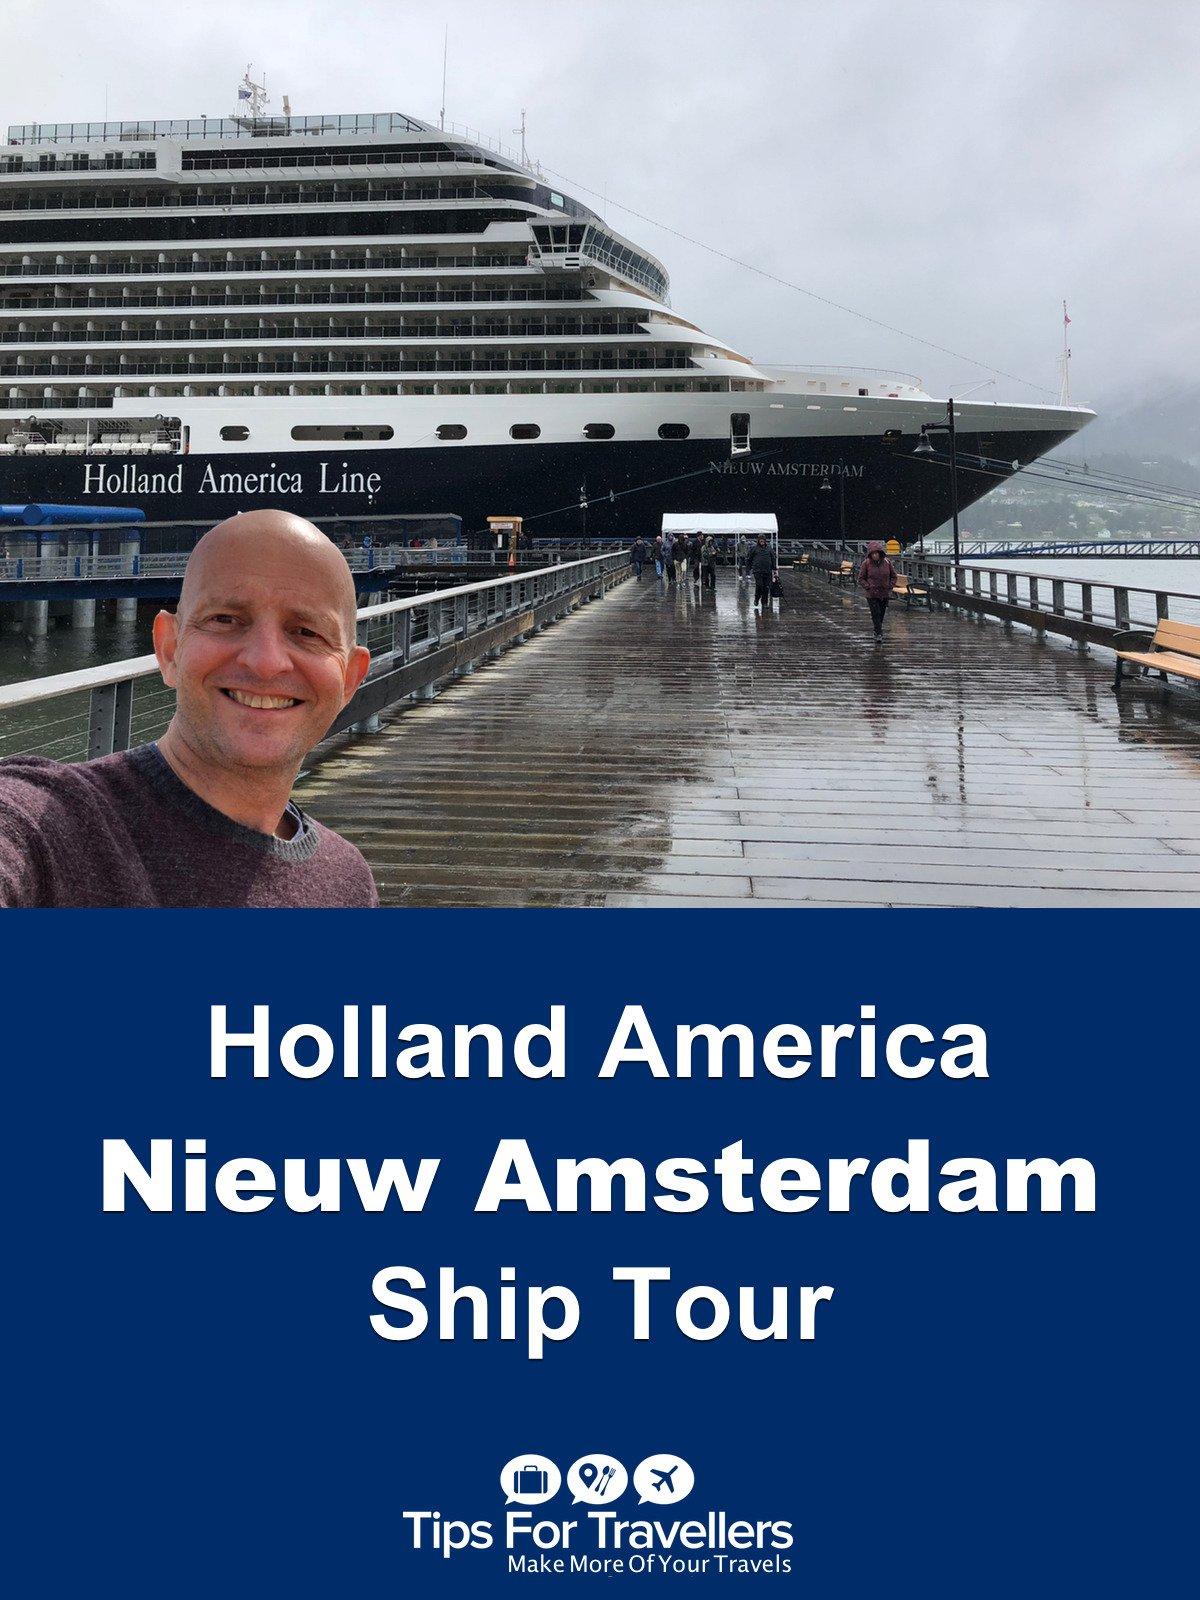 Clip: Holland America Nieuw Amsterdam Ship Tour